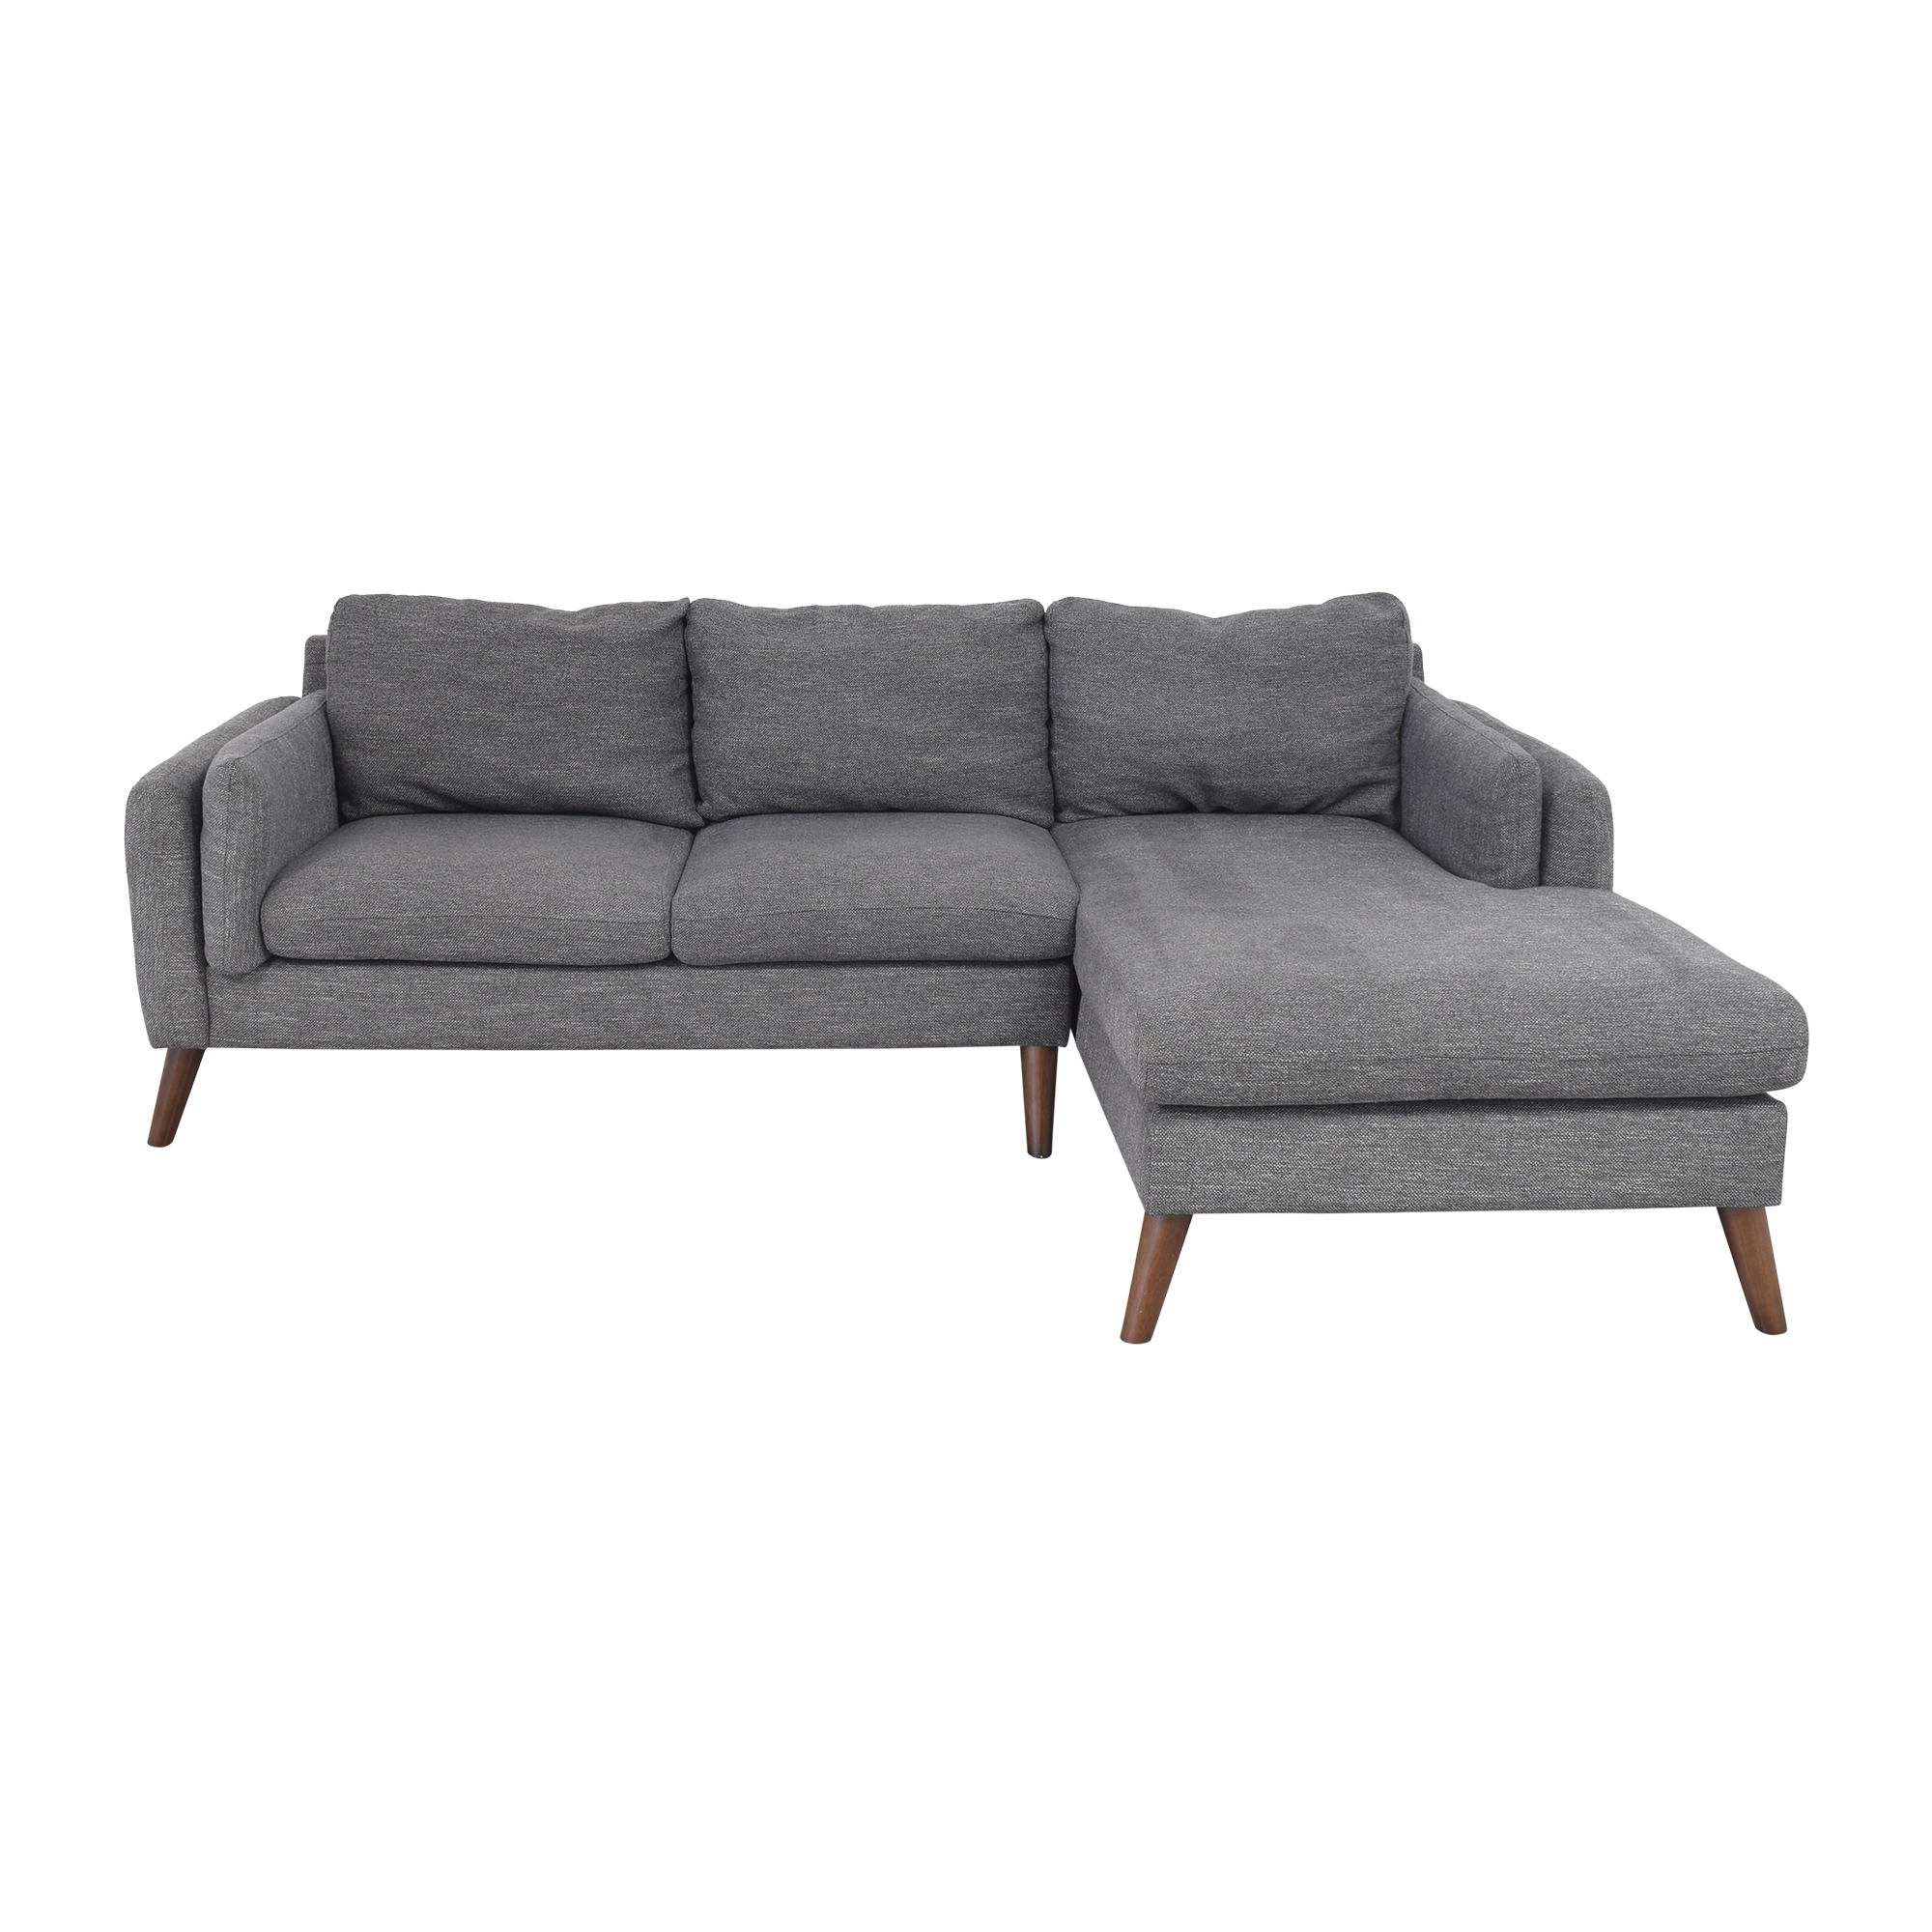 Wayfair Wayfair Jordana Right Hand Facing Sectional Sofa with Chaise price